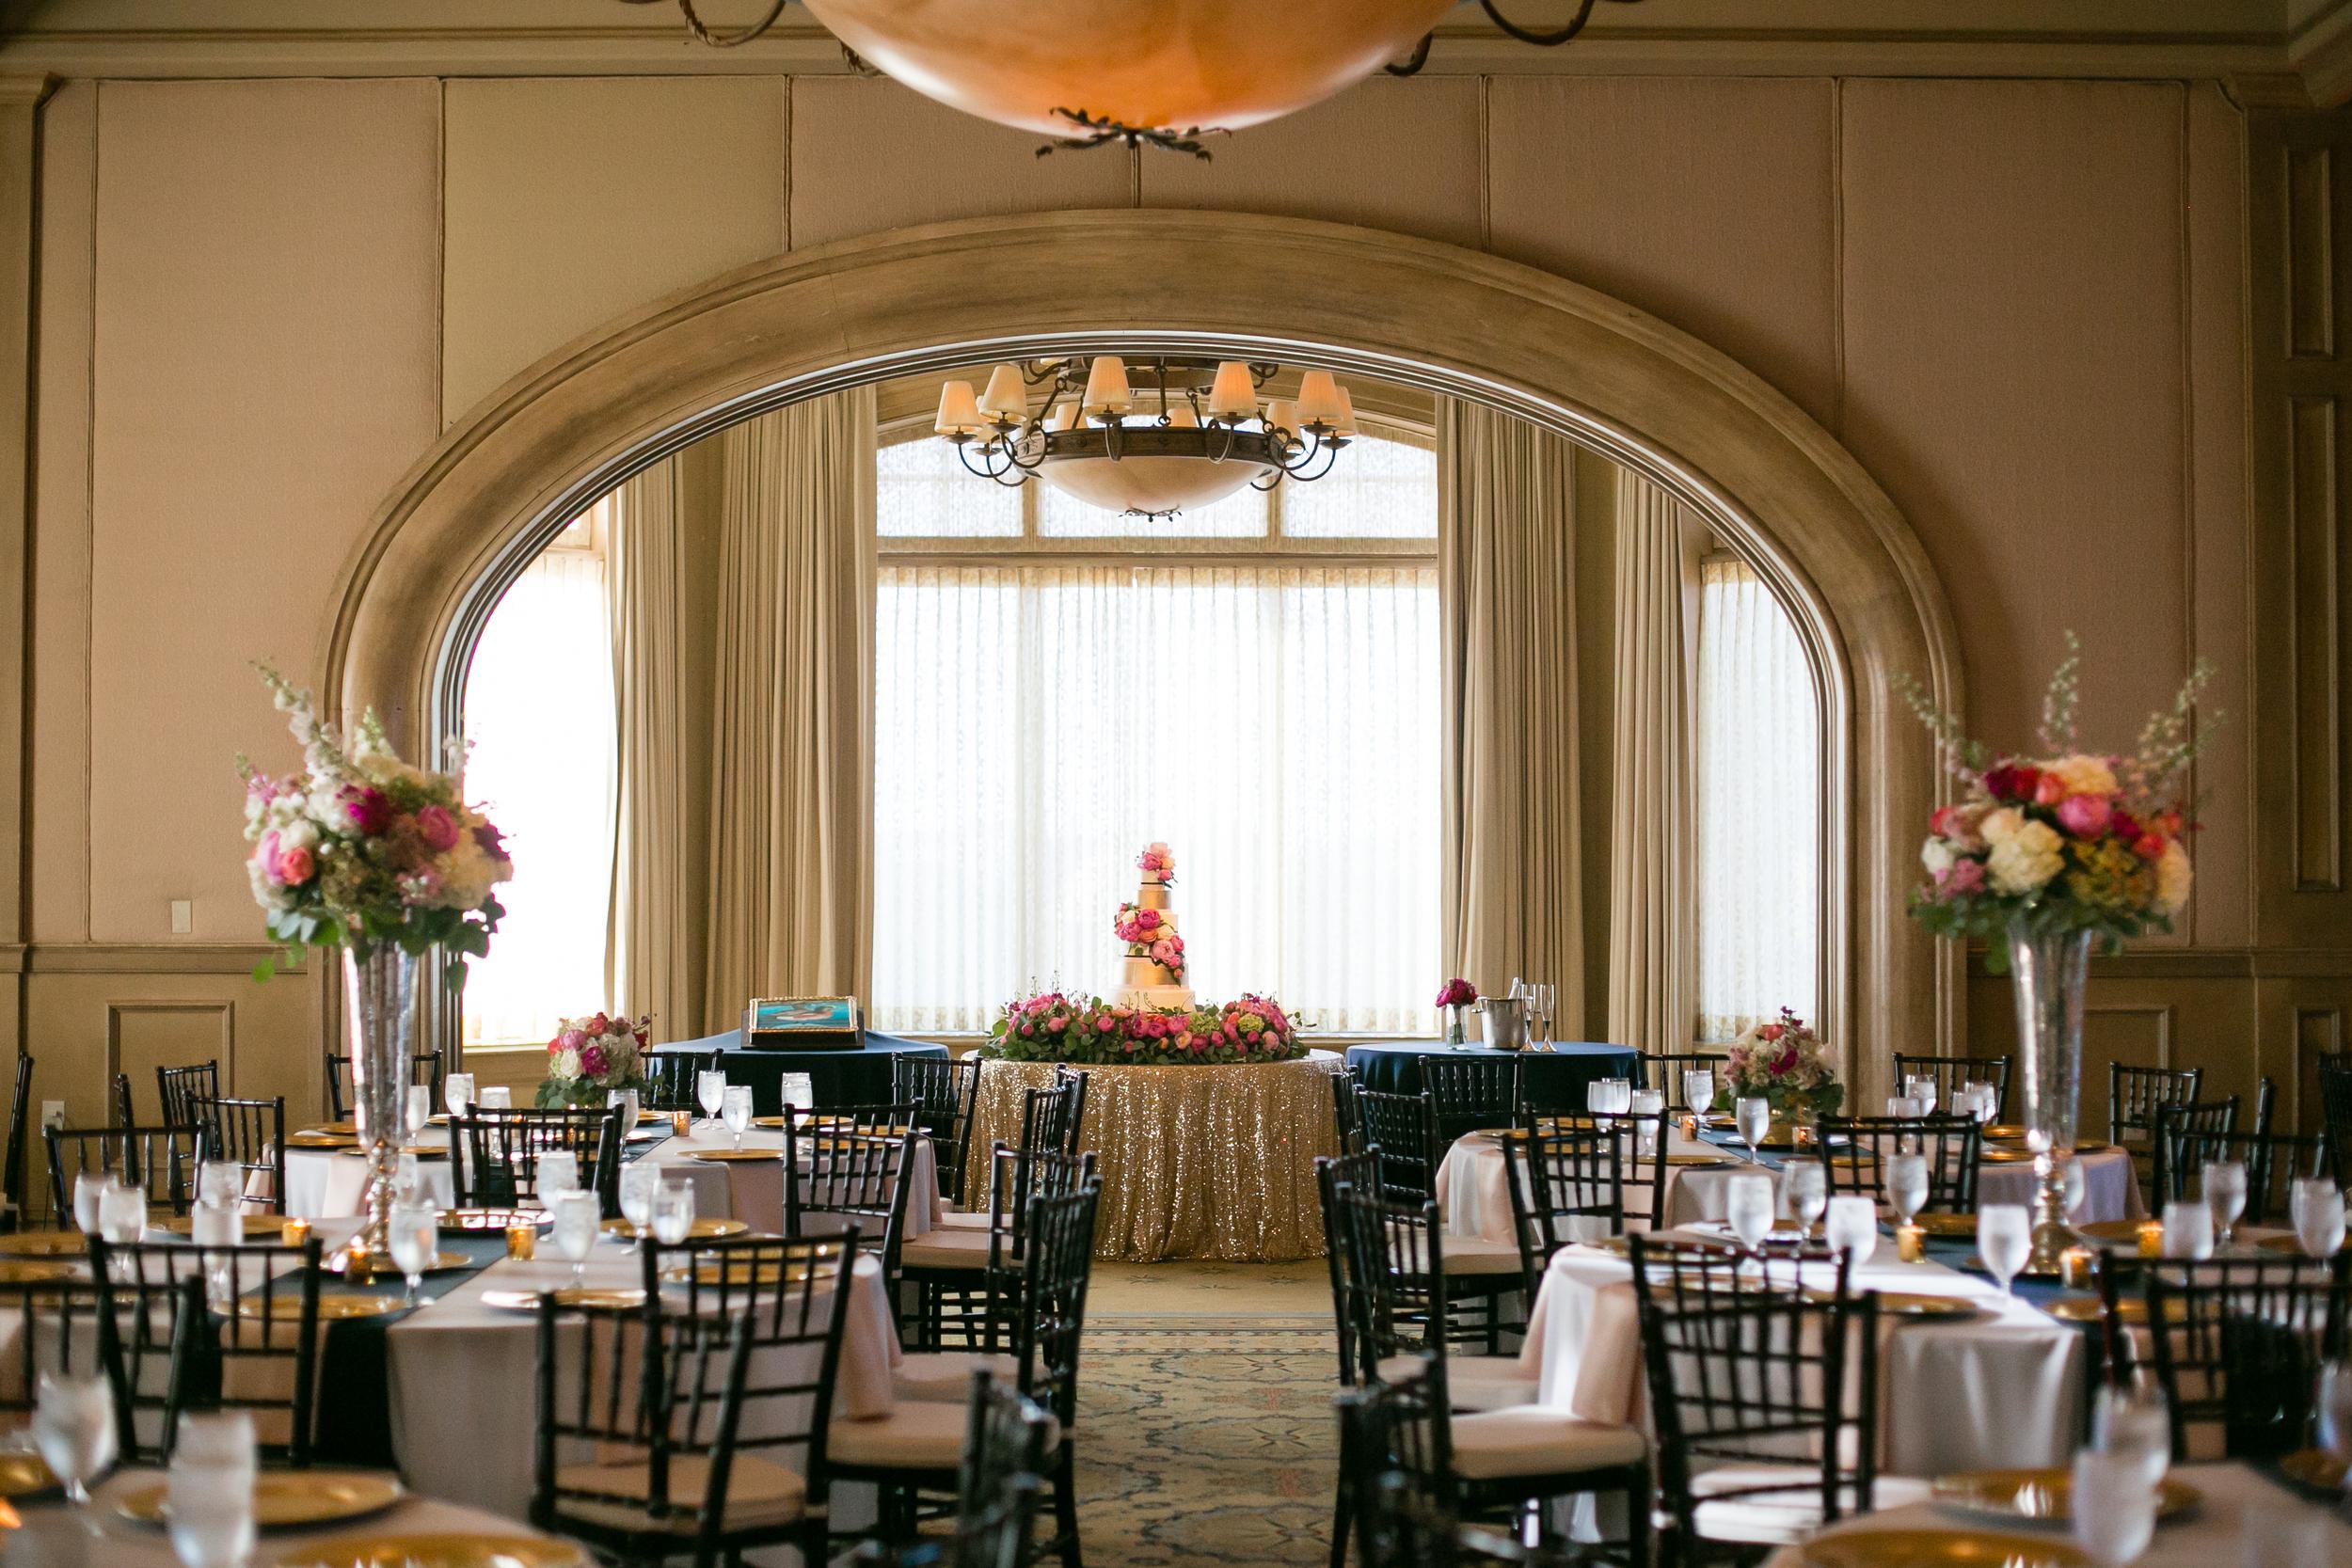 Bliss OKC | Aubrey Marie Photography | Tony Foss Flowers | Gaillardia Country Club | Mood Party Rentals | Wedding Reception